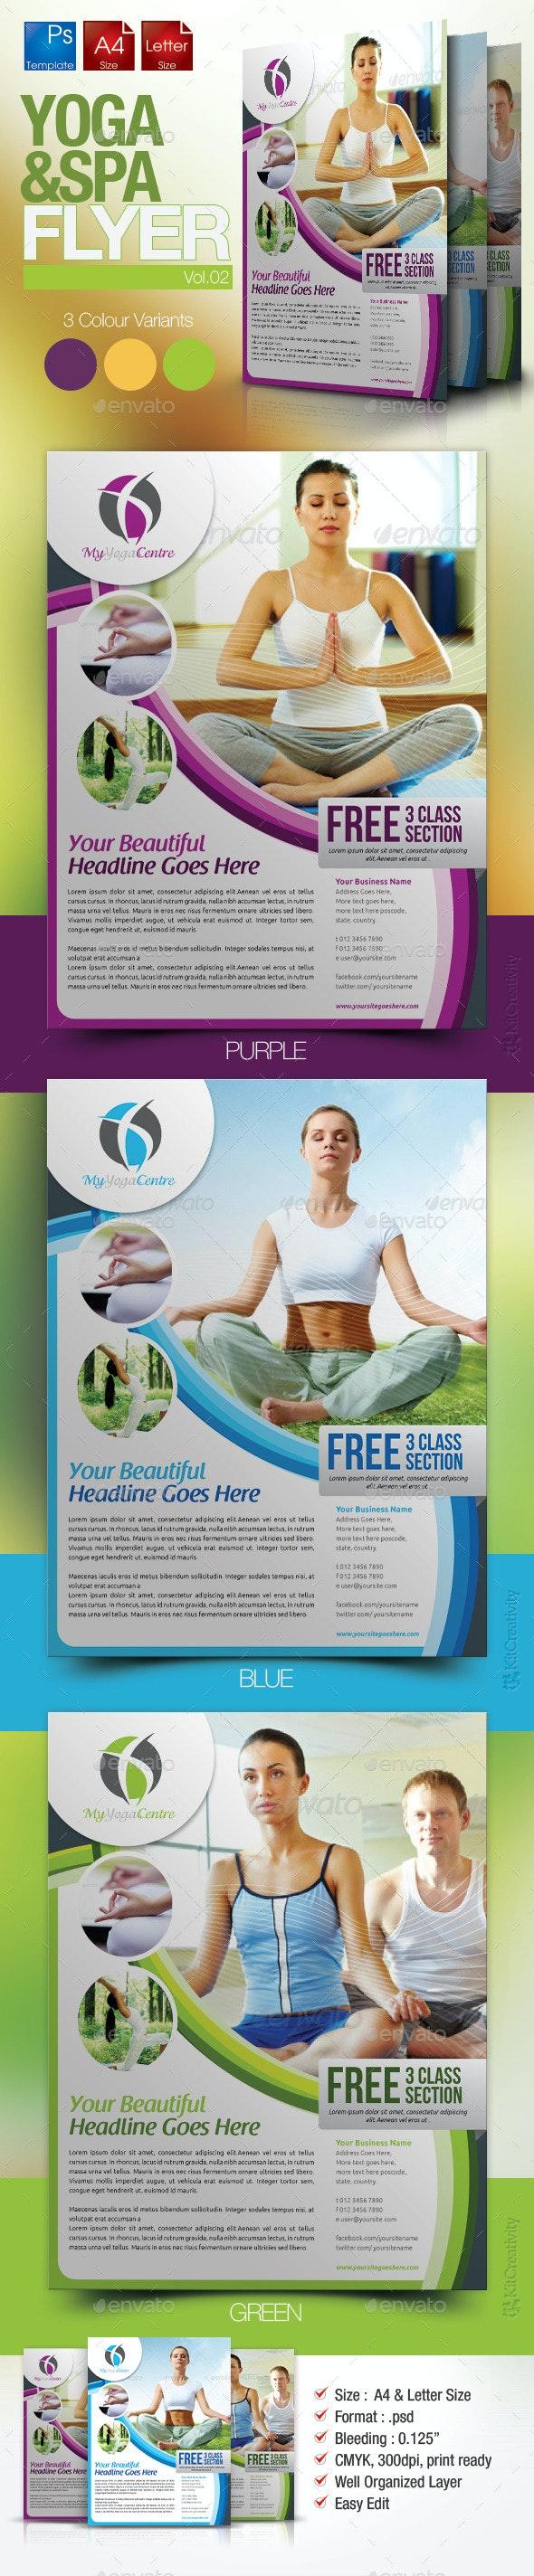 Simple Yoga Flyer Vol.2 - Miscellaneous Events